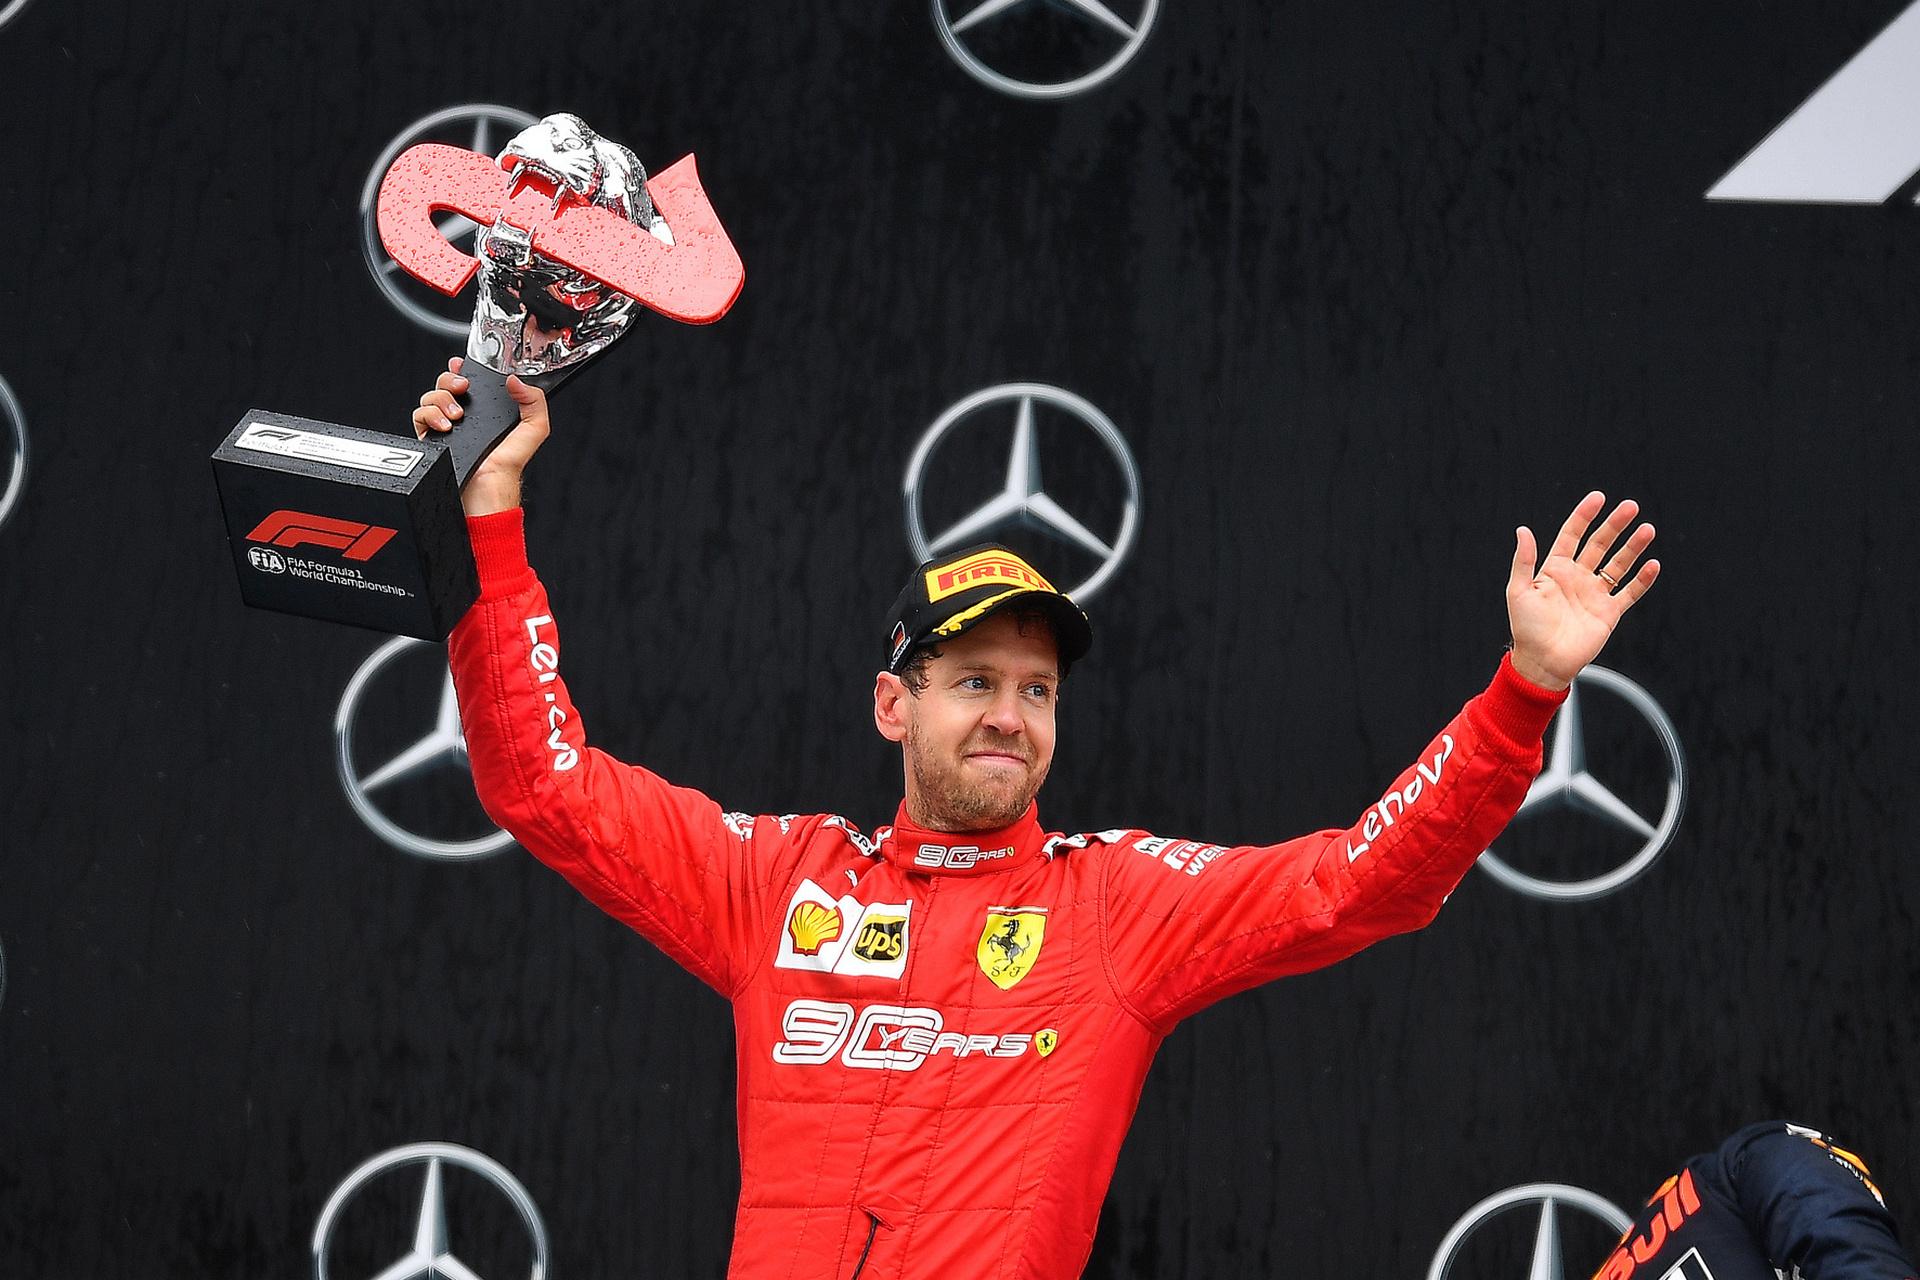 Der Heppenheimer Sebastian Vettel wechselt 2021 zum Aston Martin-Team